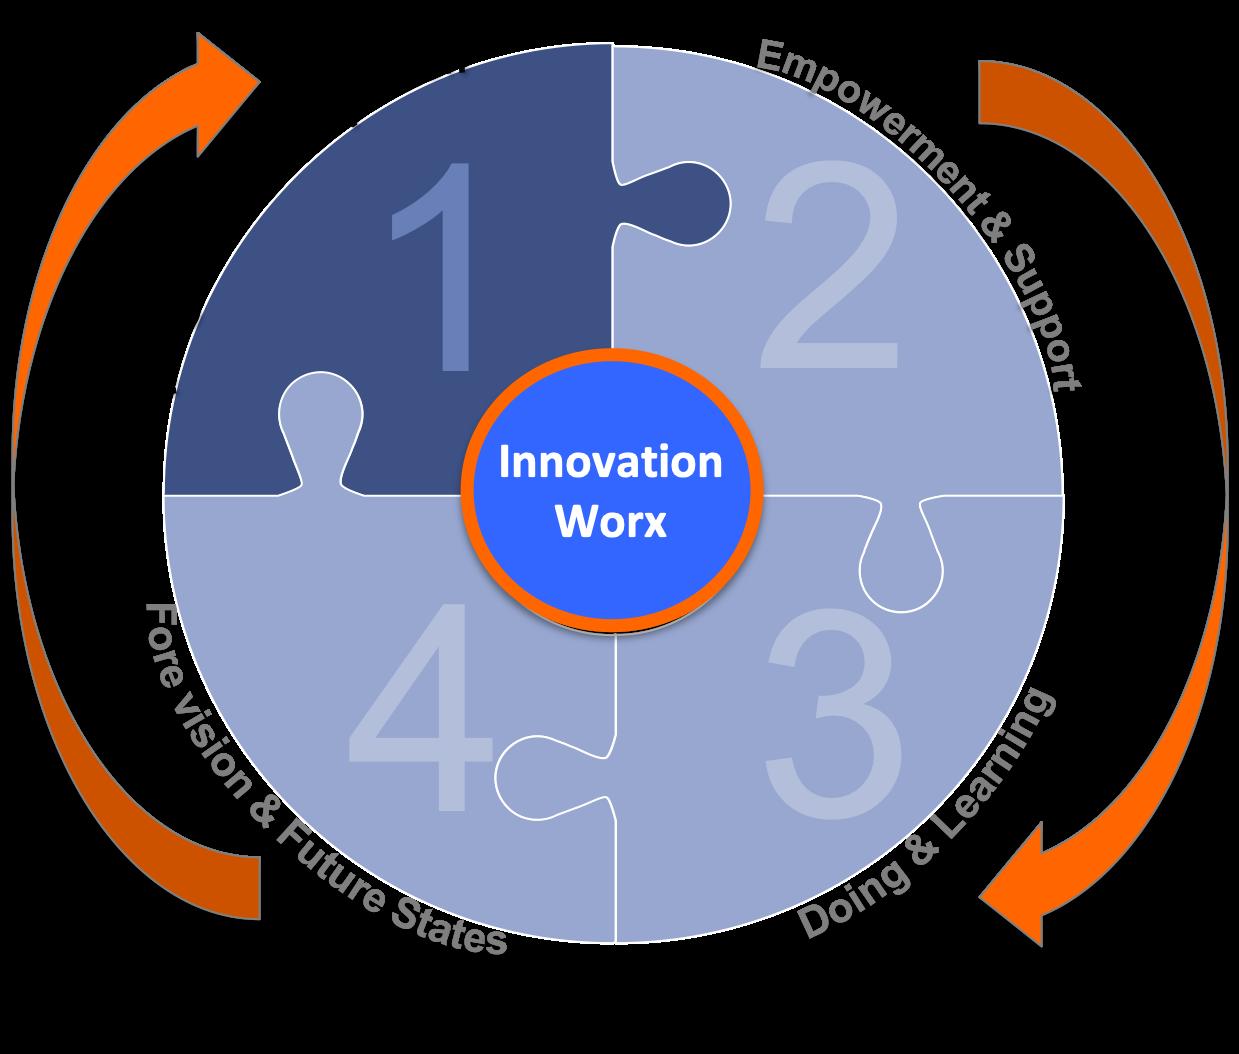 InnovationWorx_Minus.png